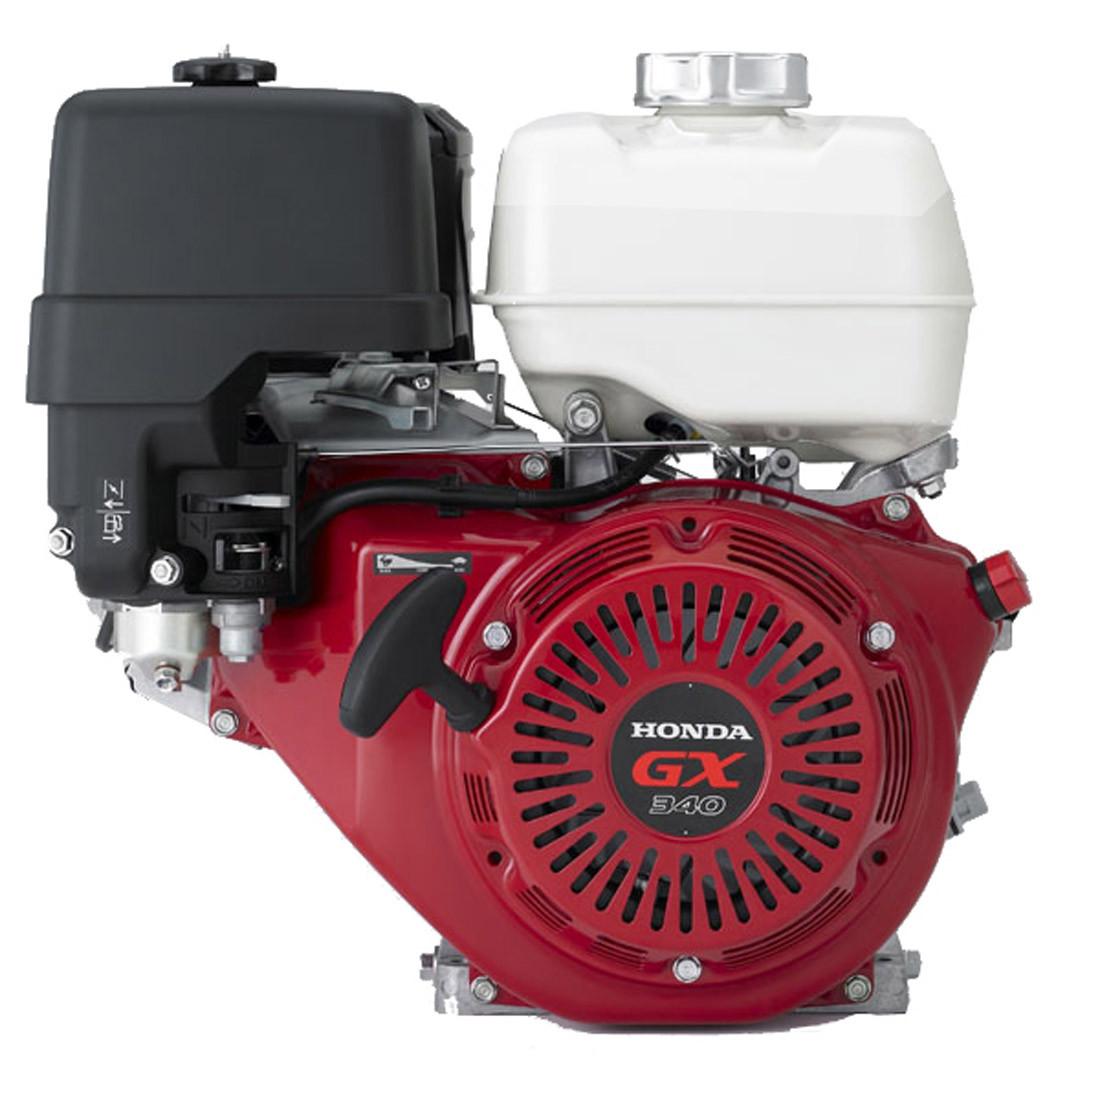 Honda Engines Gx340 Series Horizontal Shaft Reduction Engine